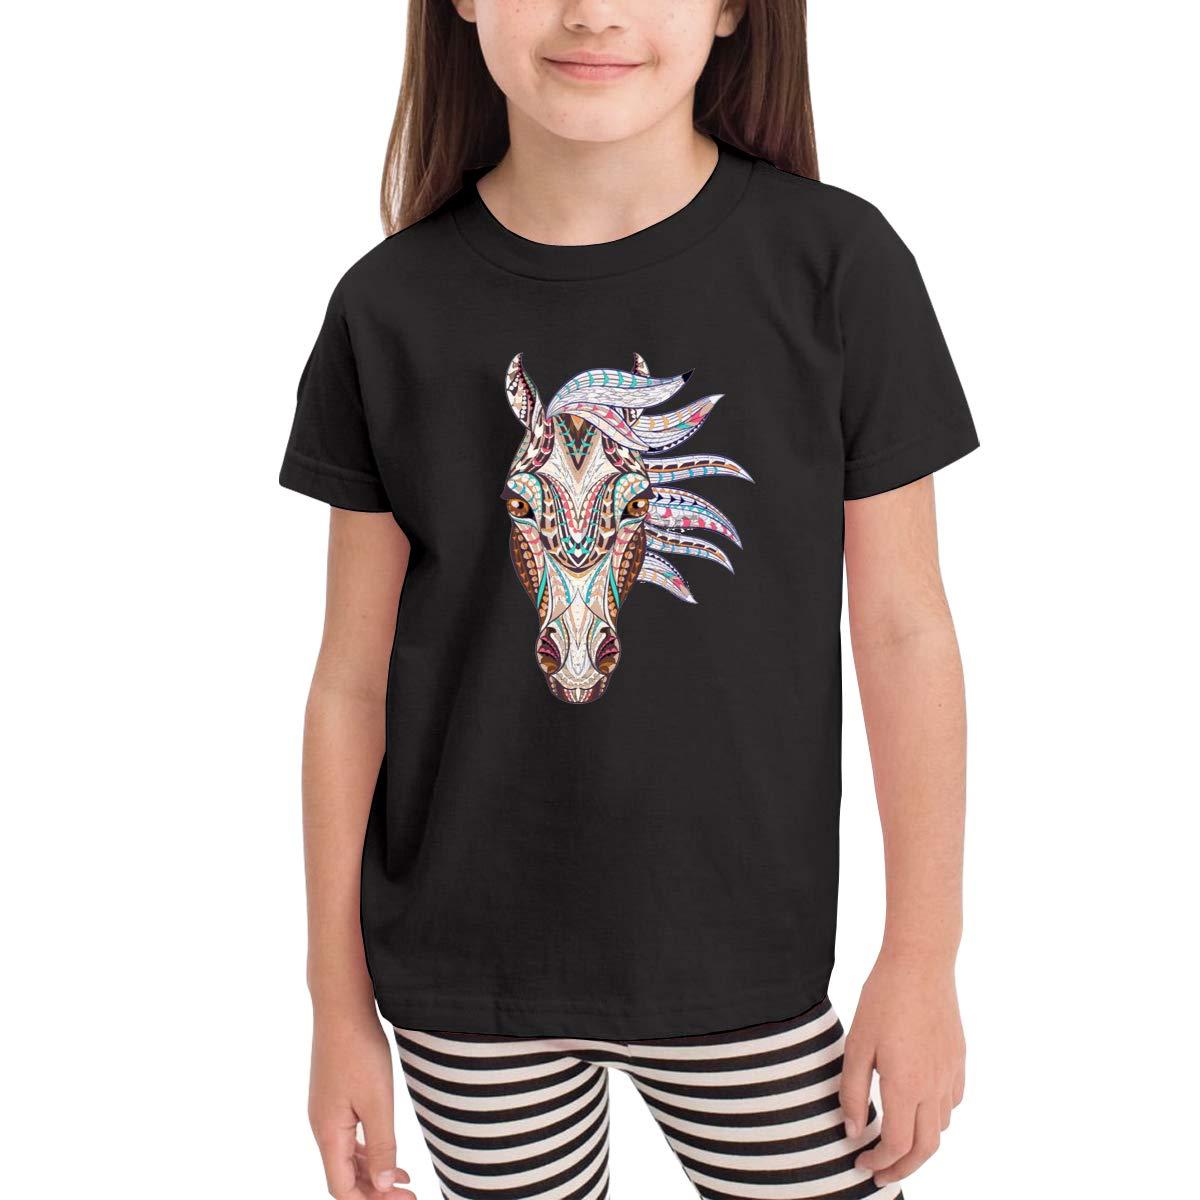 Kids T-Shirt Tops Black Colored Geometry Horse Unisex Youths Short Sleeve T-Shirt